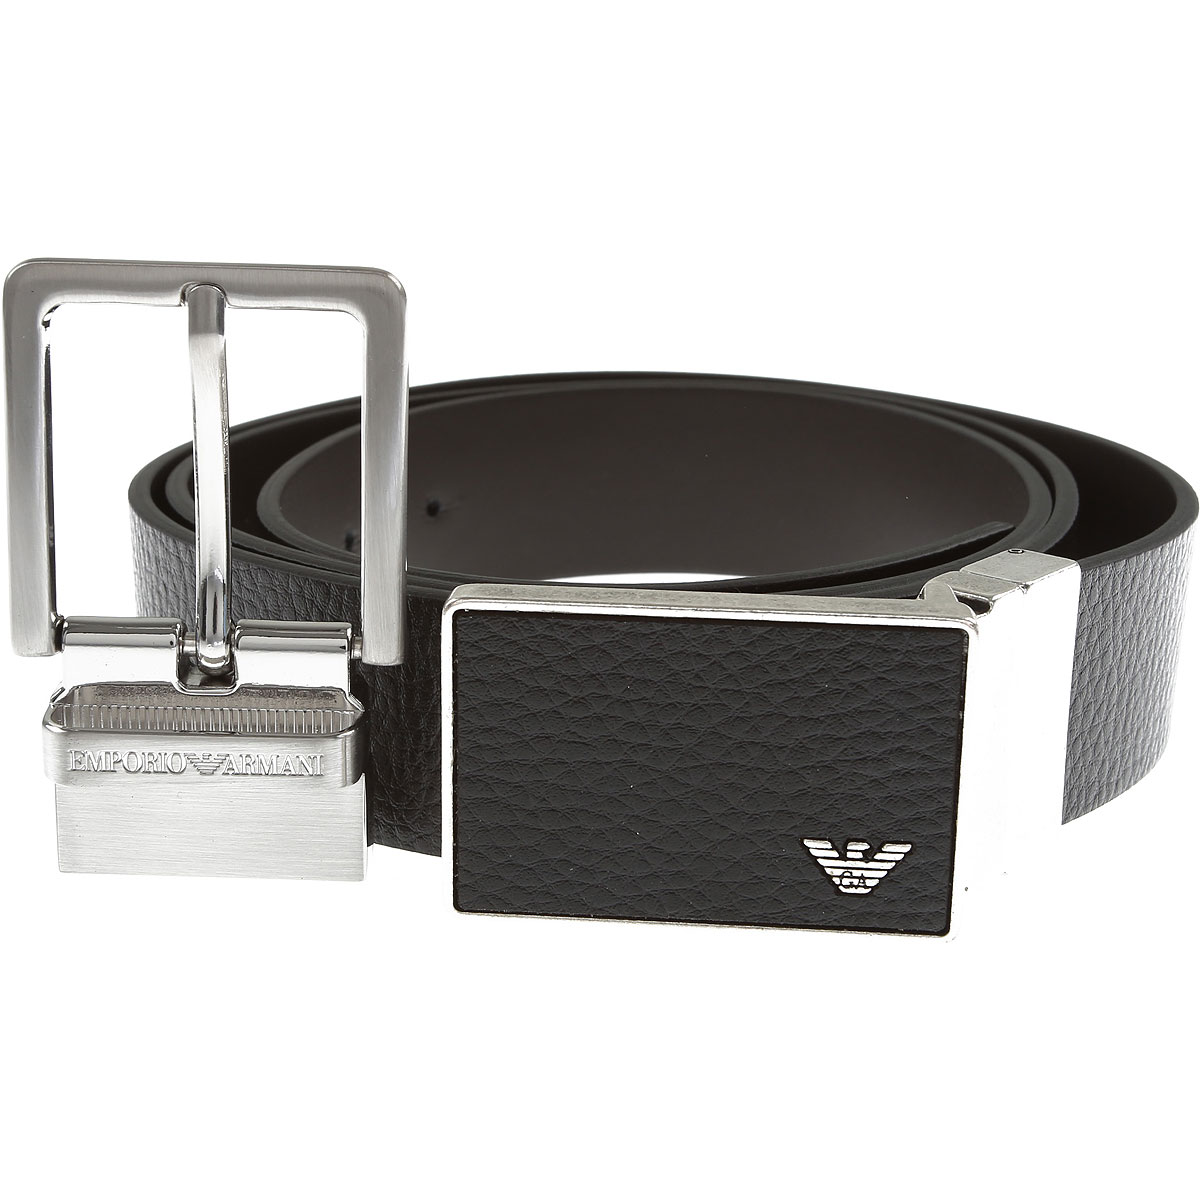 Emporio Armani Belts, Black, Leather, 2019